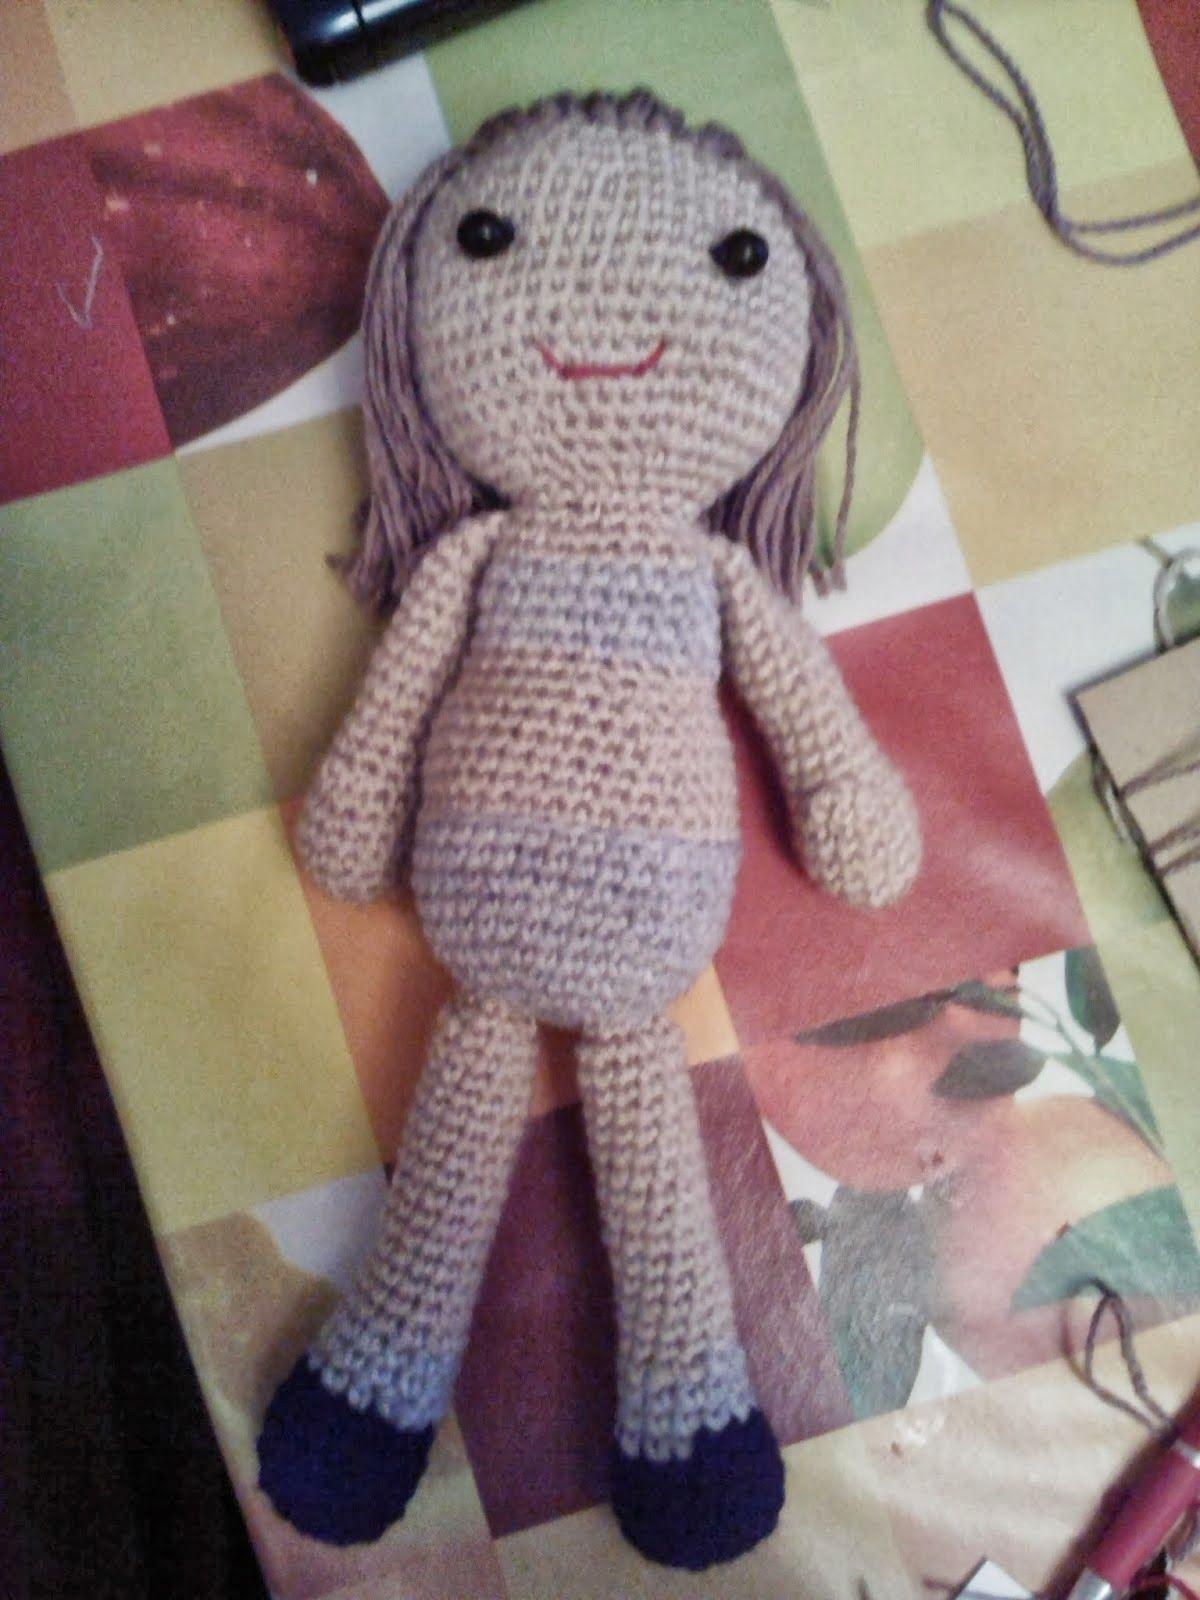 Pin de Regla Martinez en muñecas crochet | Pinterest | Amigurumi ...